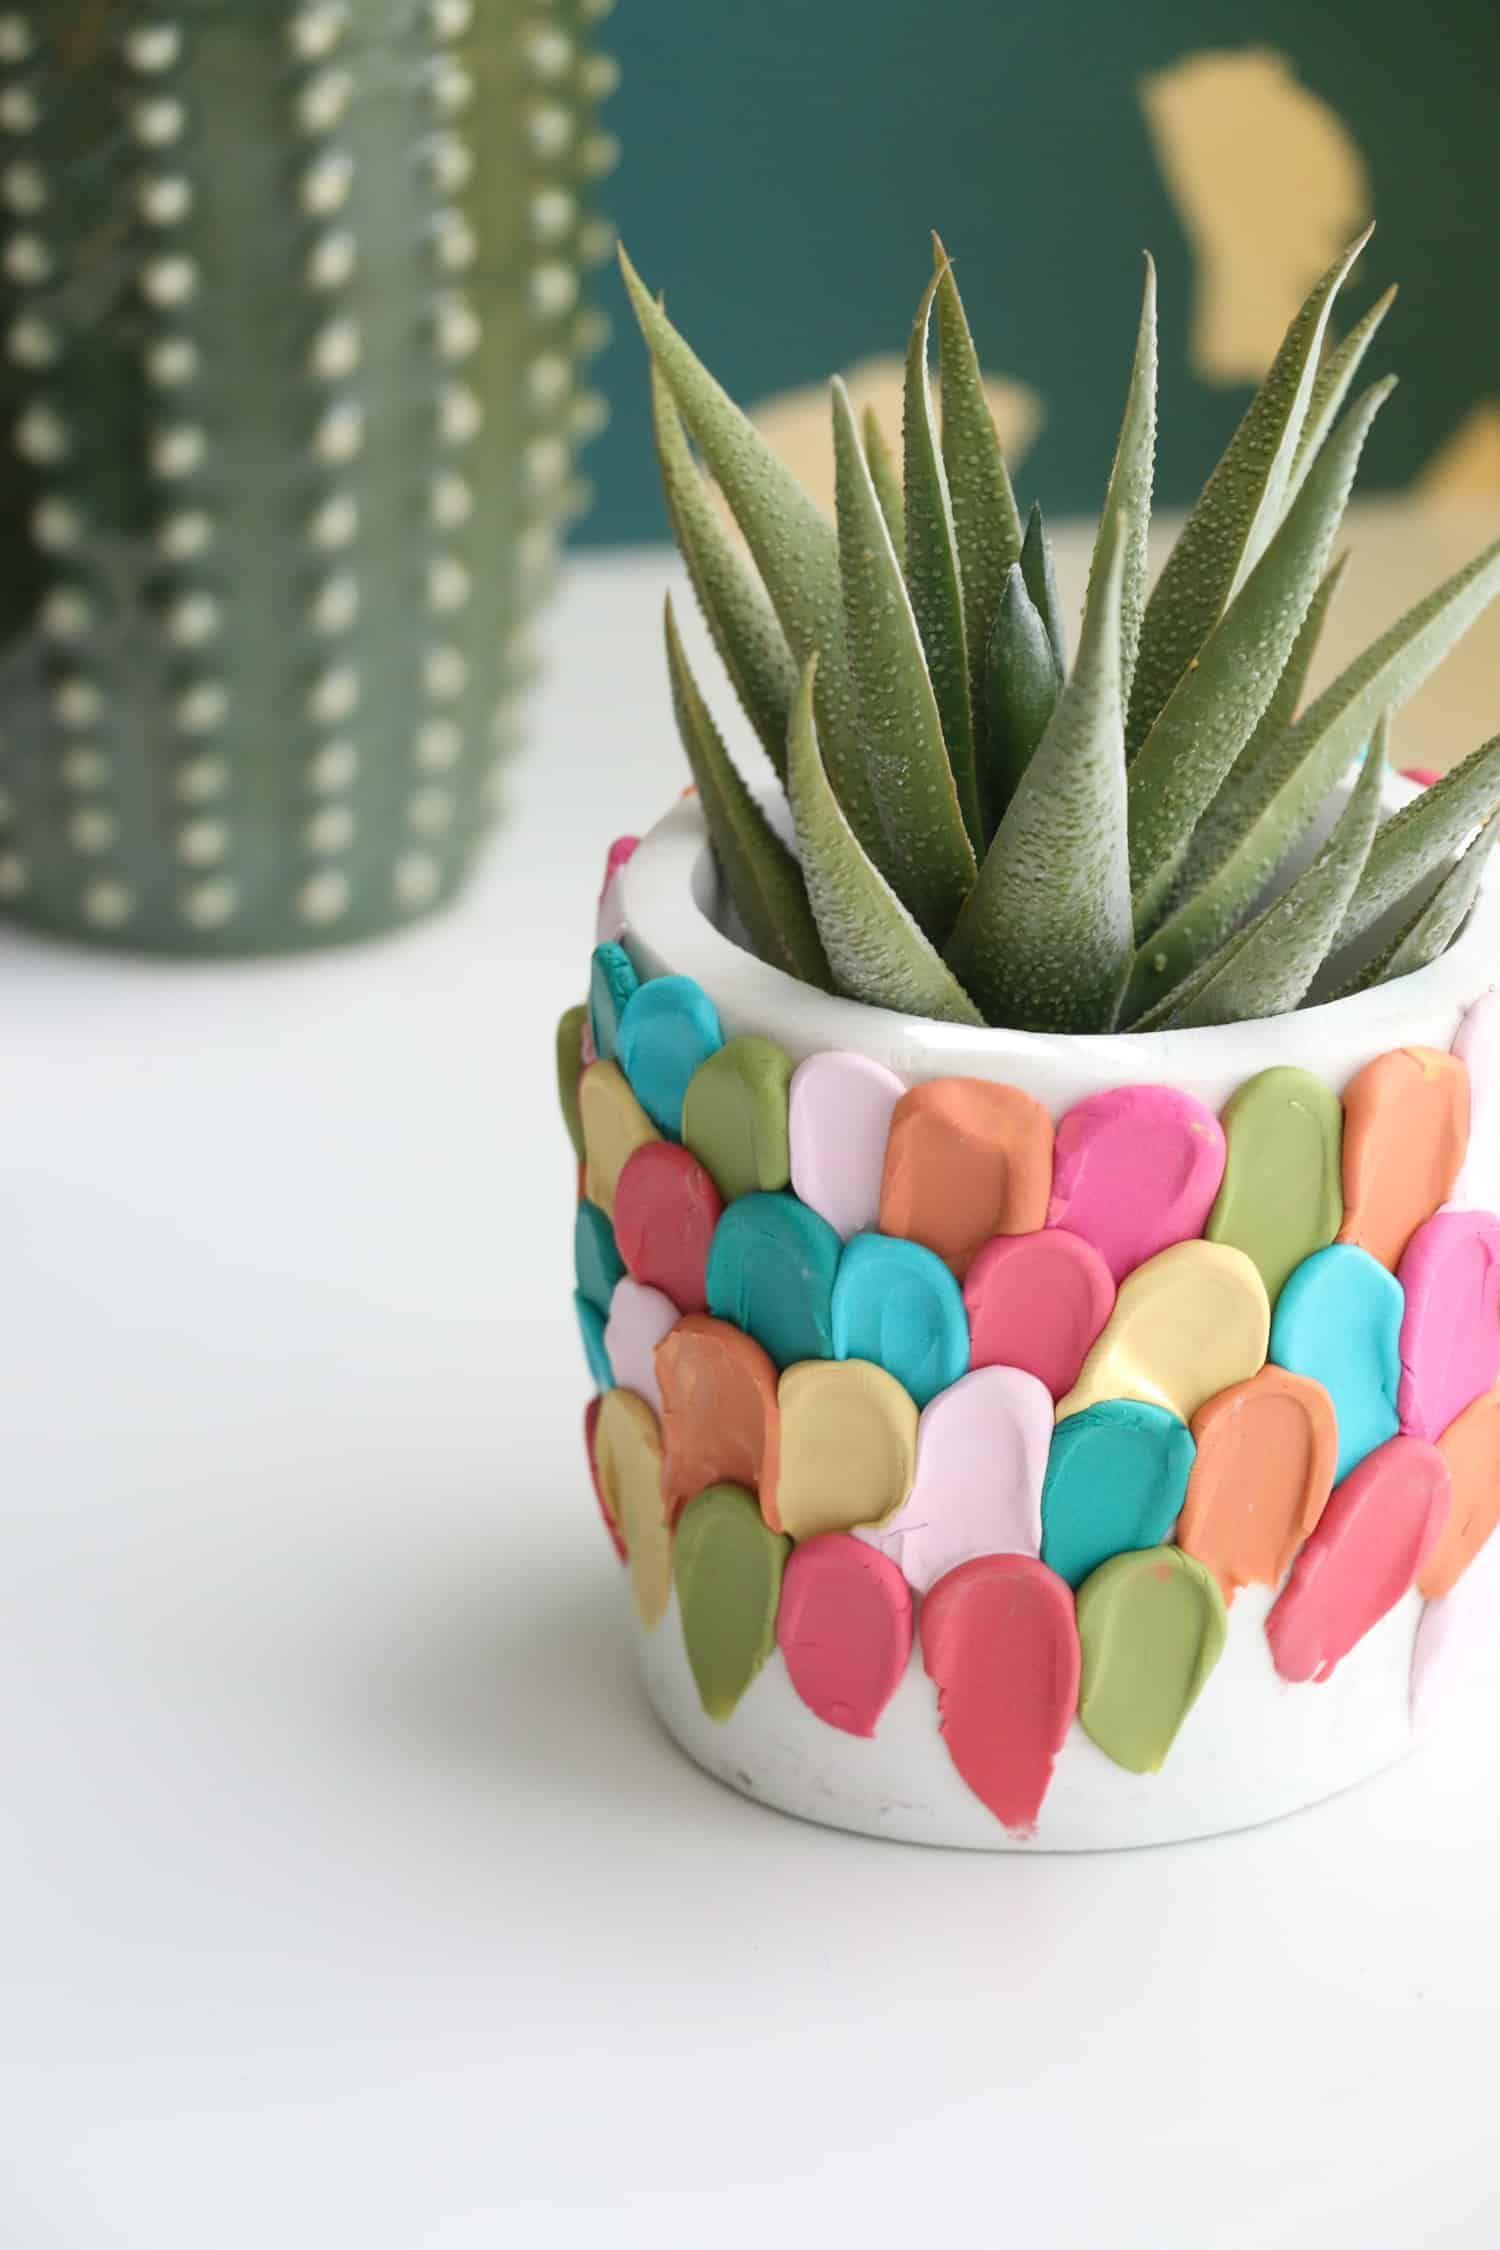 Make a Clay Petal Planter